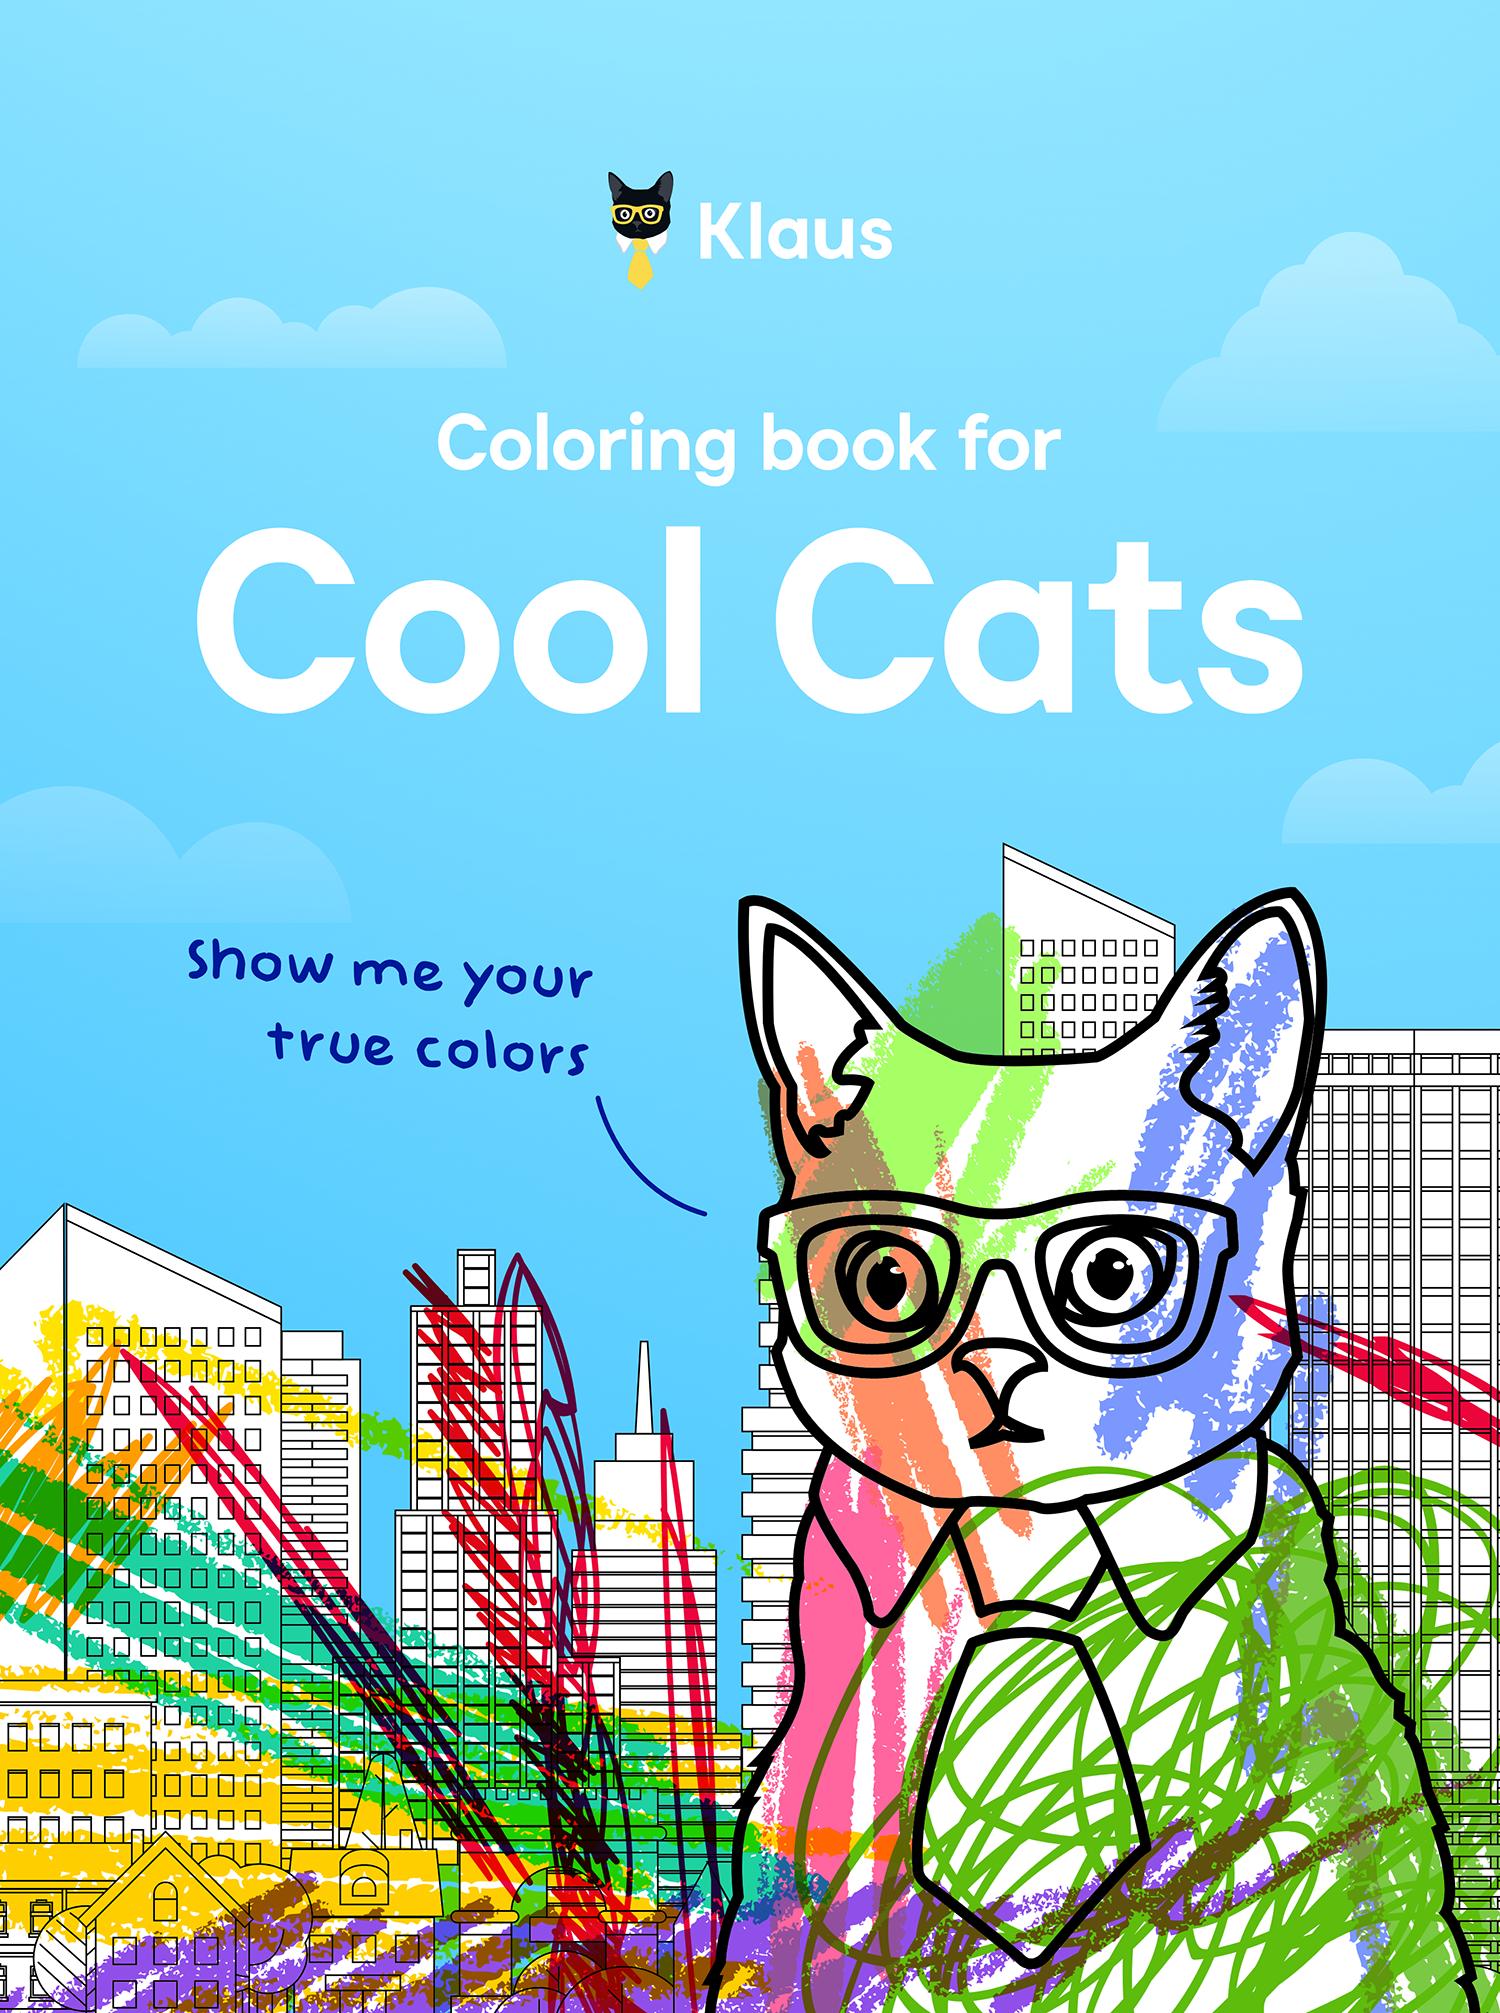 Klaus Coloring Book